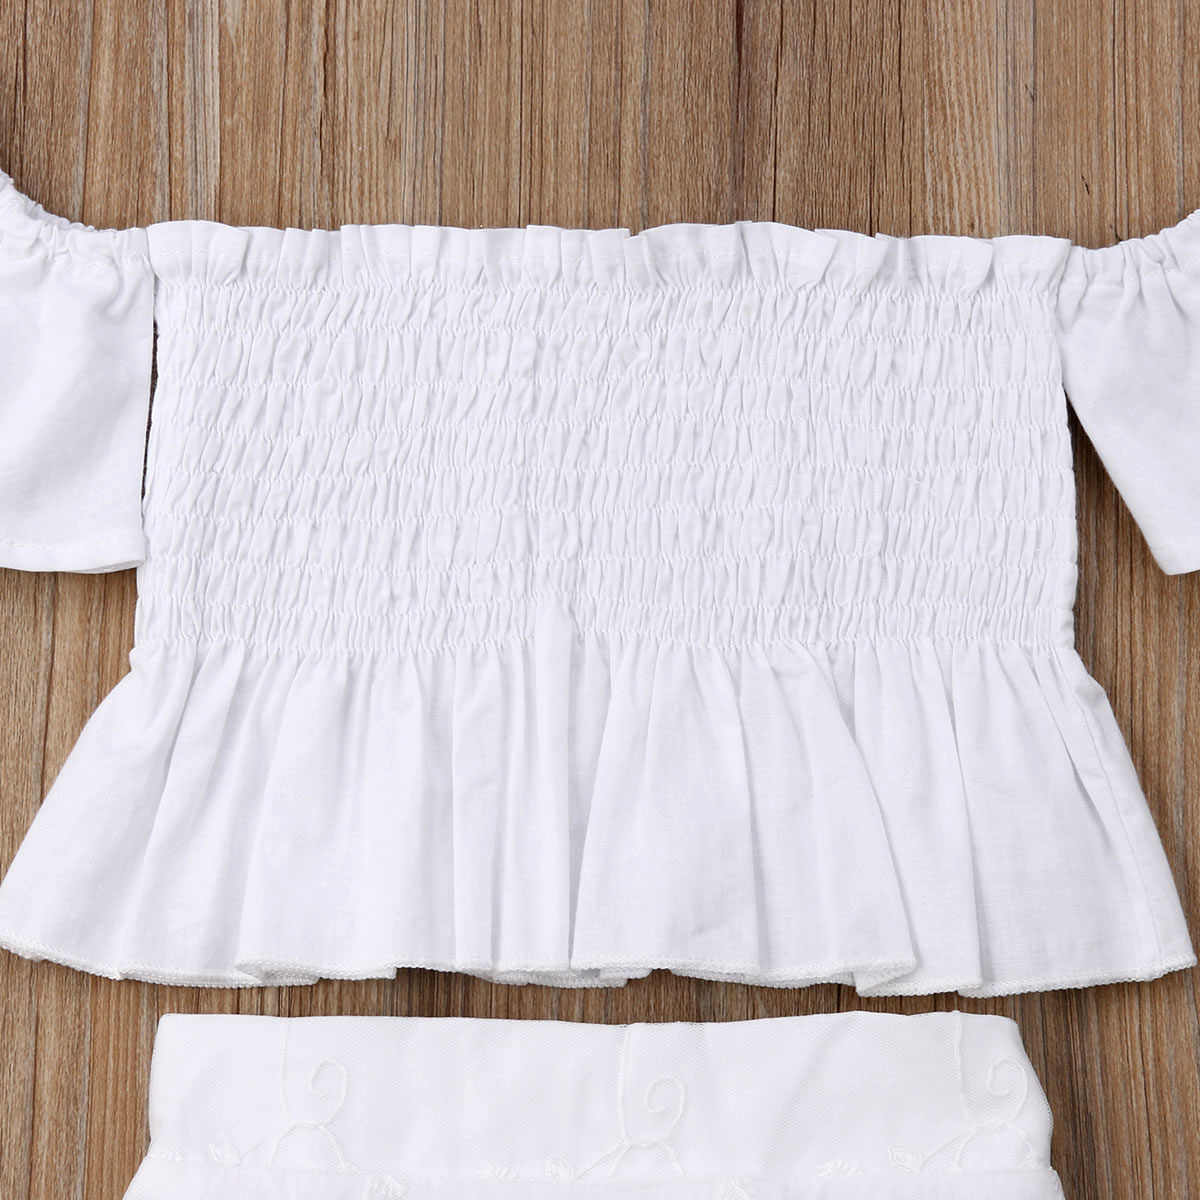 2019 Nieuwste Stijl Peuter Kids Baby Meisje Witte Kant Bloemen Tops Lange Rok Schattig 2Pcs Outfit Set Kleding Baby kleding